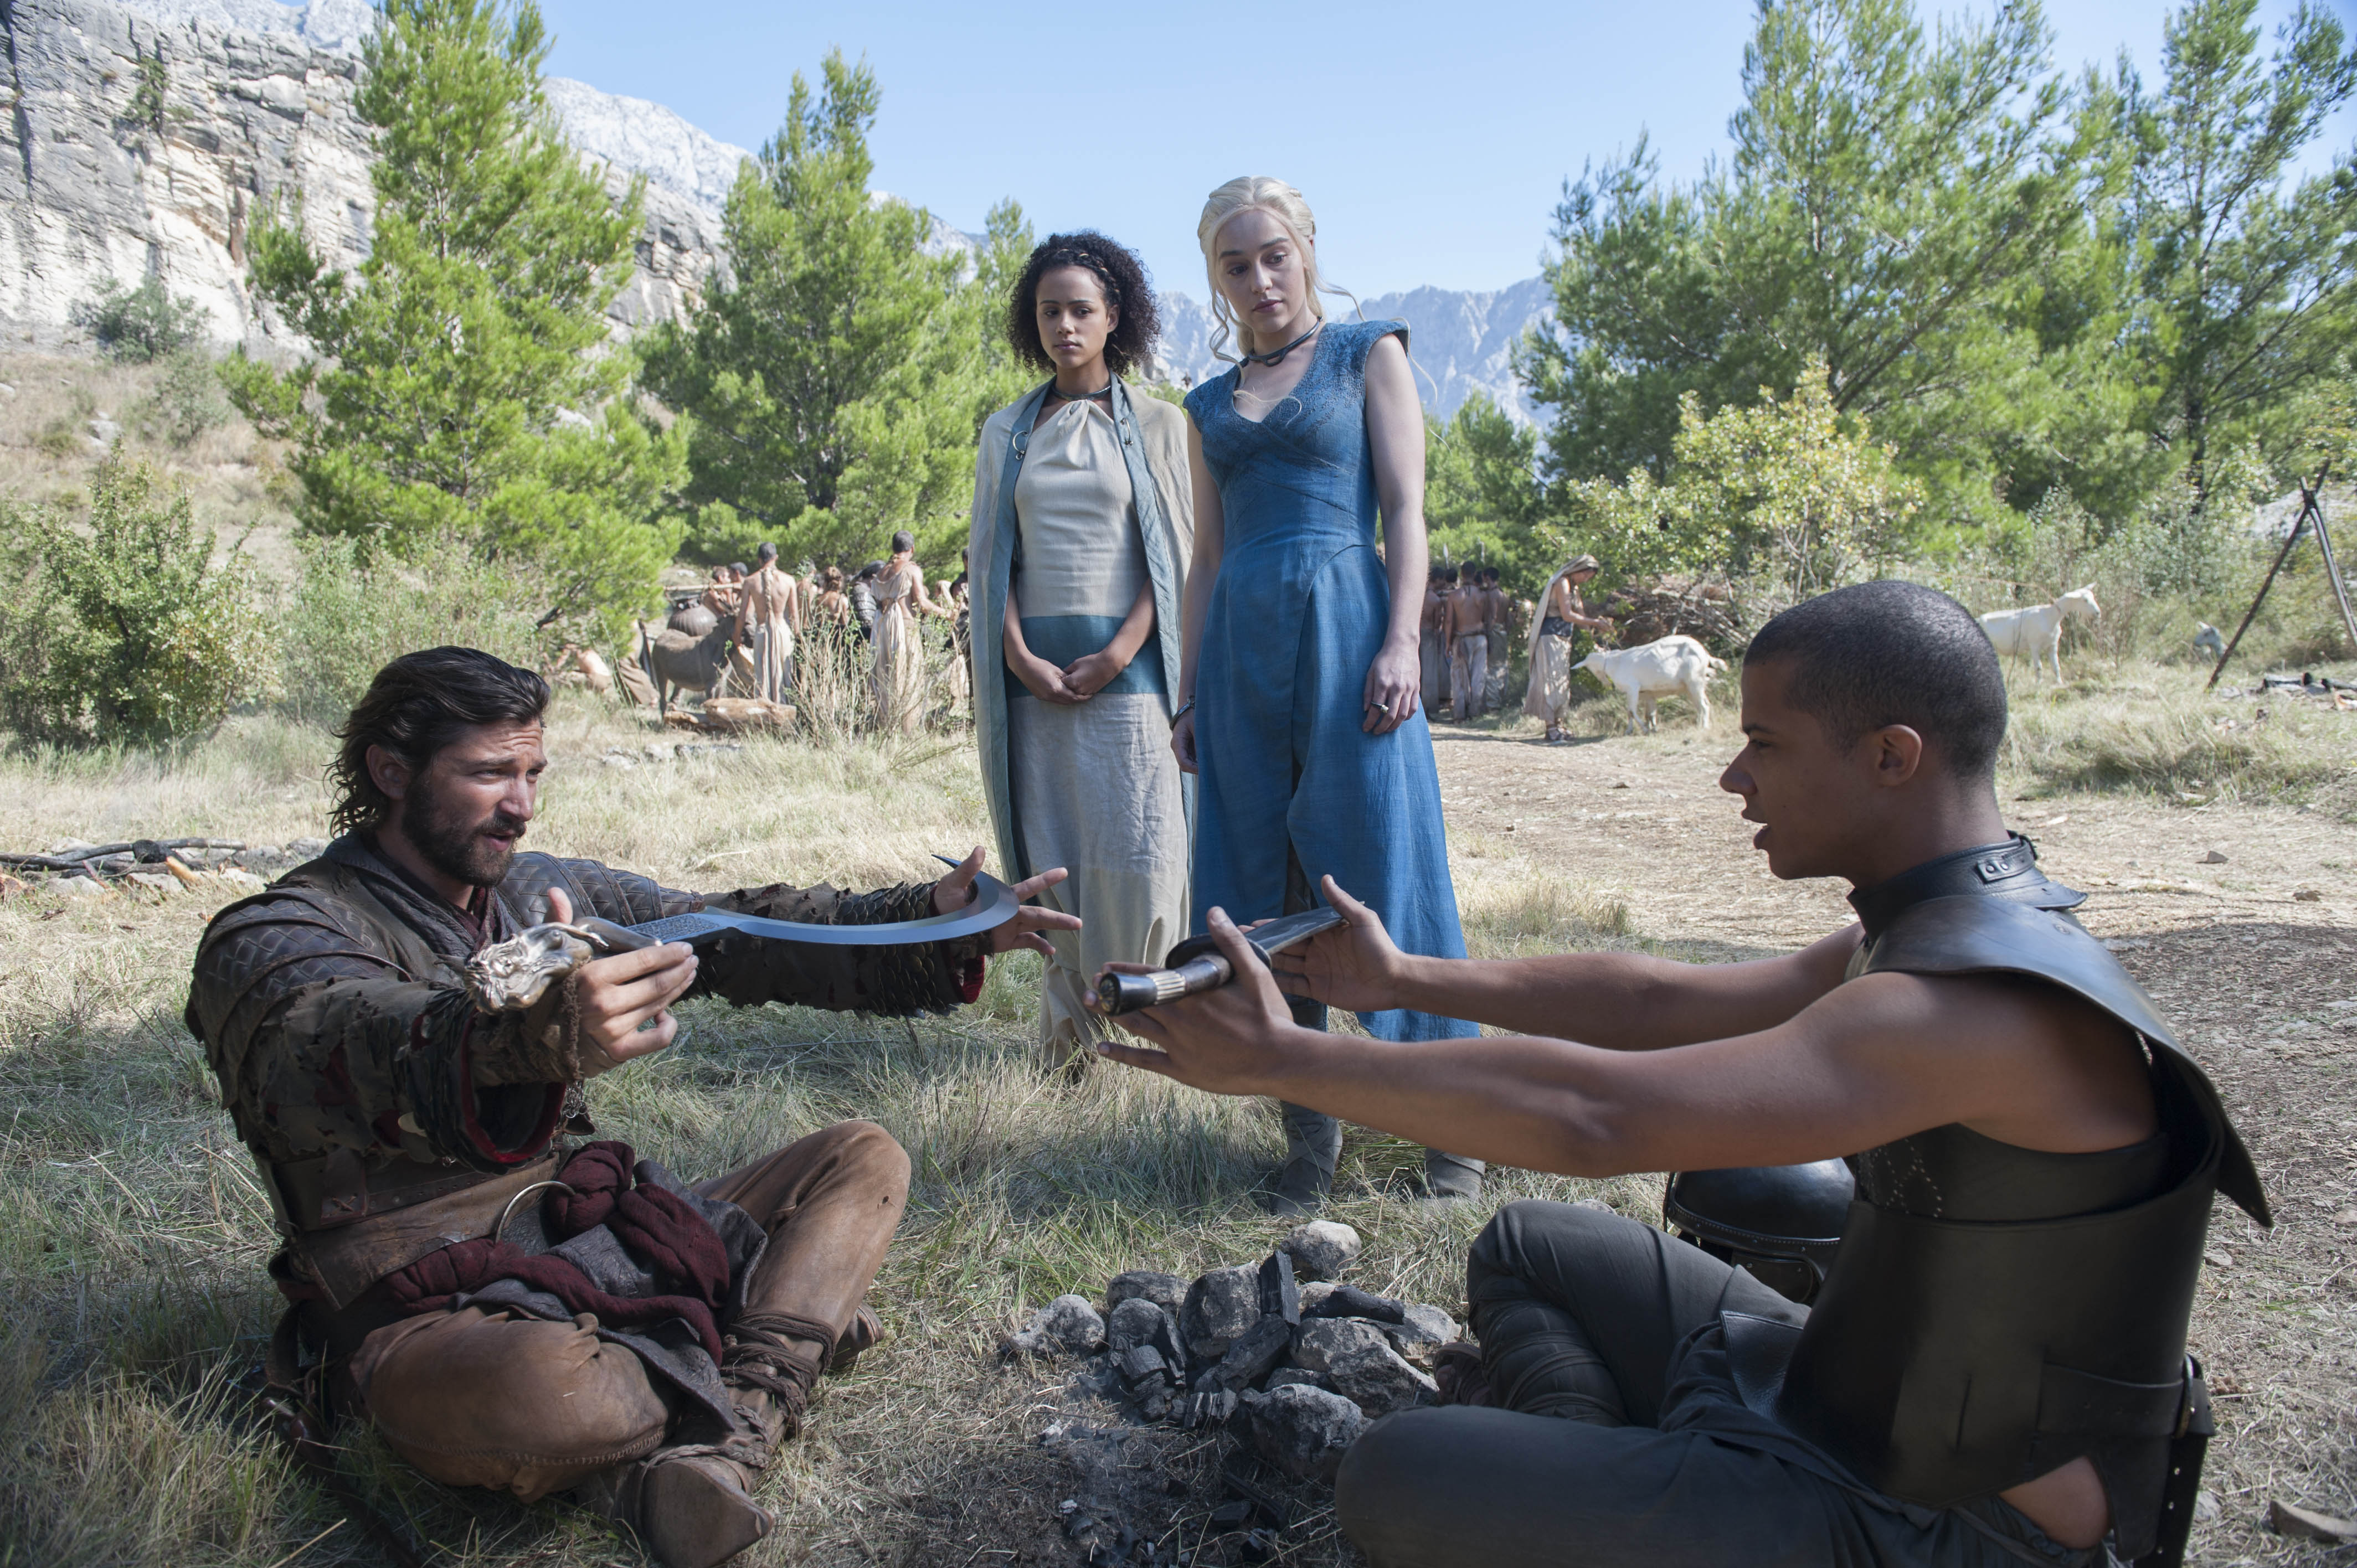 Daenerys Targaryen Season 4 - Daenerys Targaryen Photo ... Daario Naharis And Daenerys Season 4